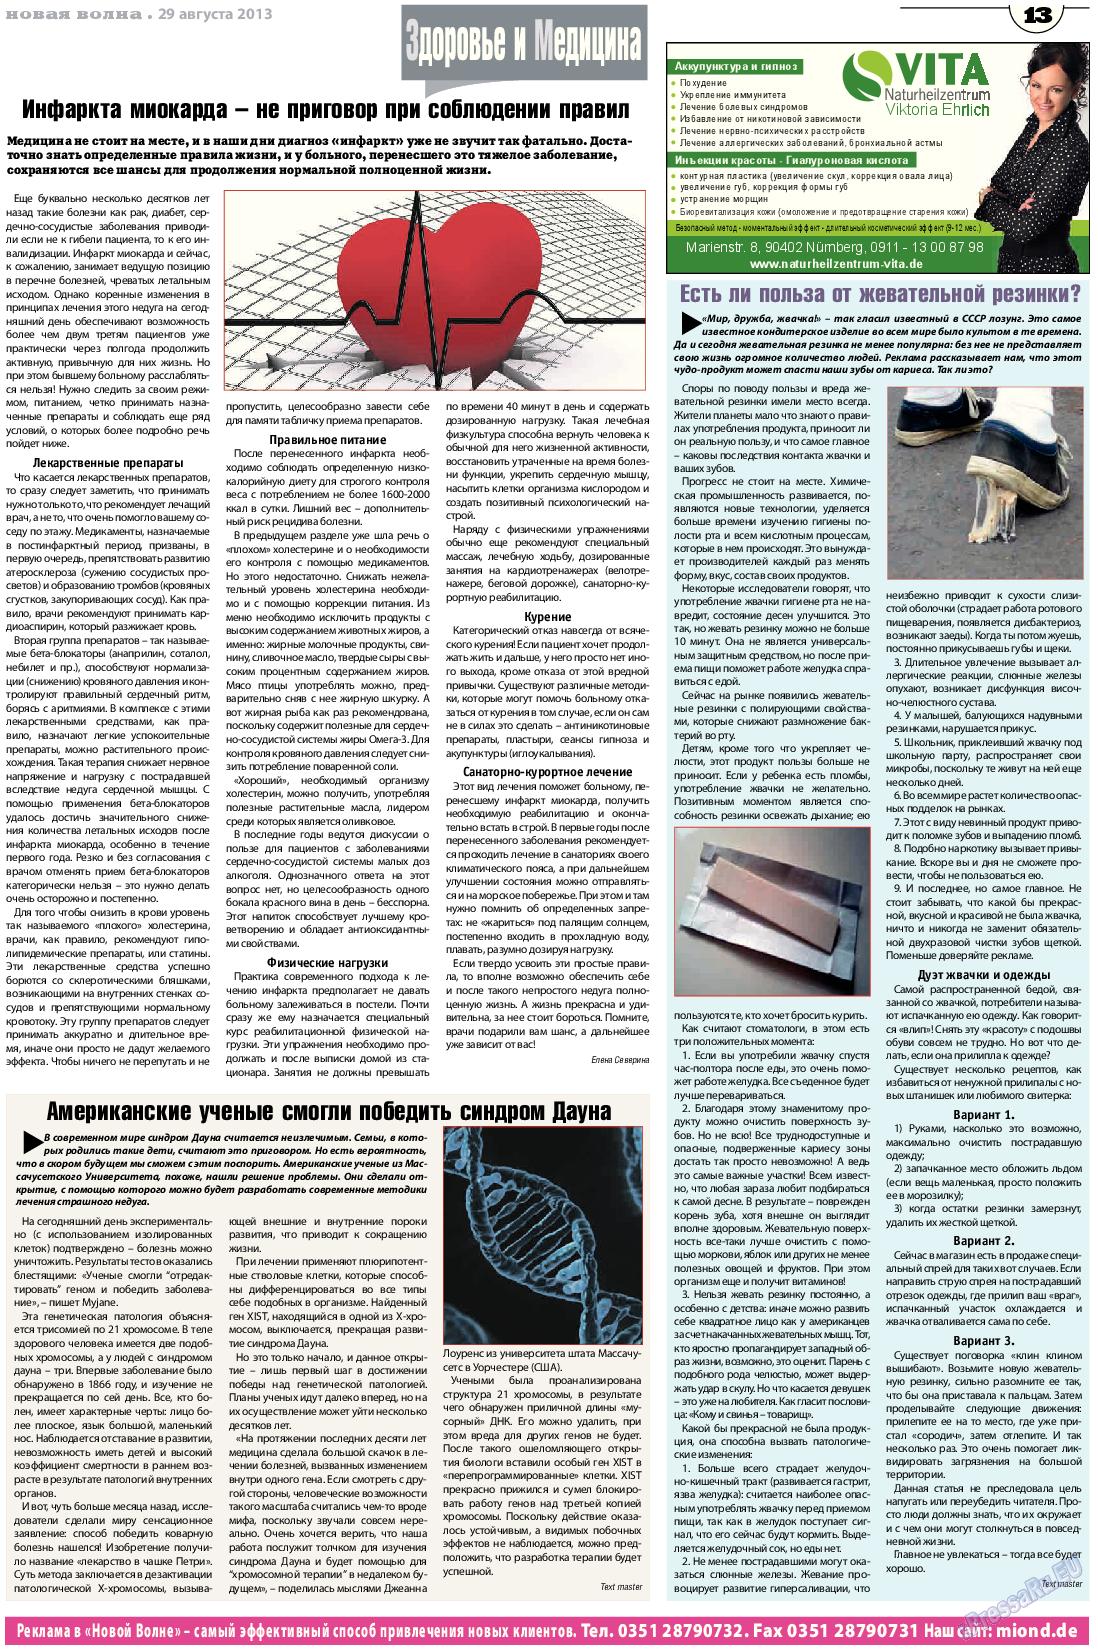 Новая Wолна (газета). 2013 год, номер 35, стр. 13